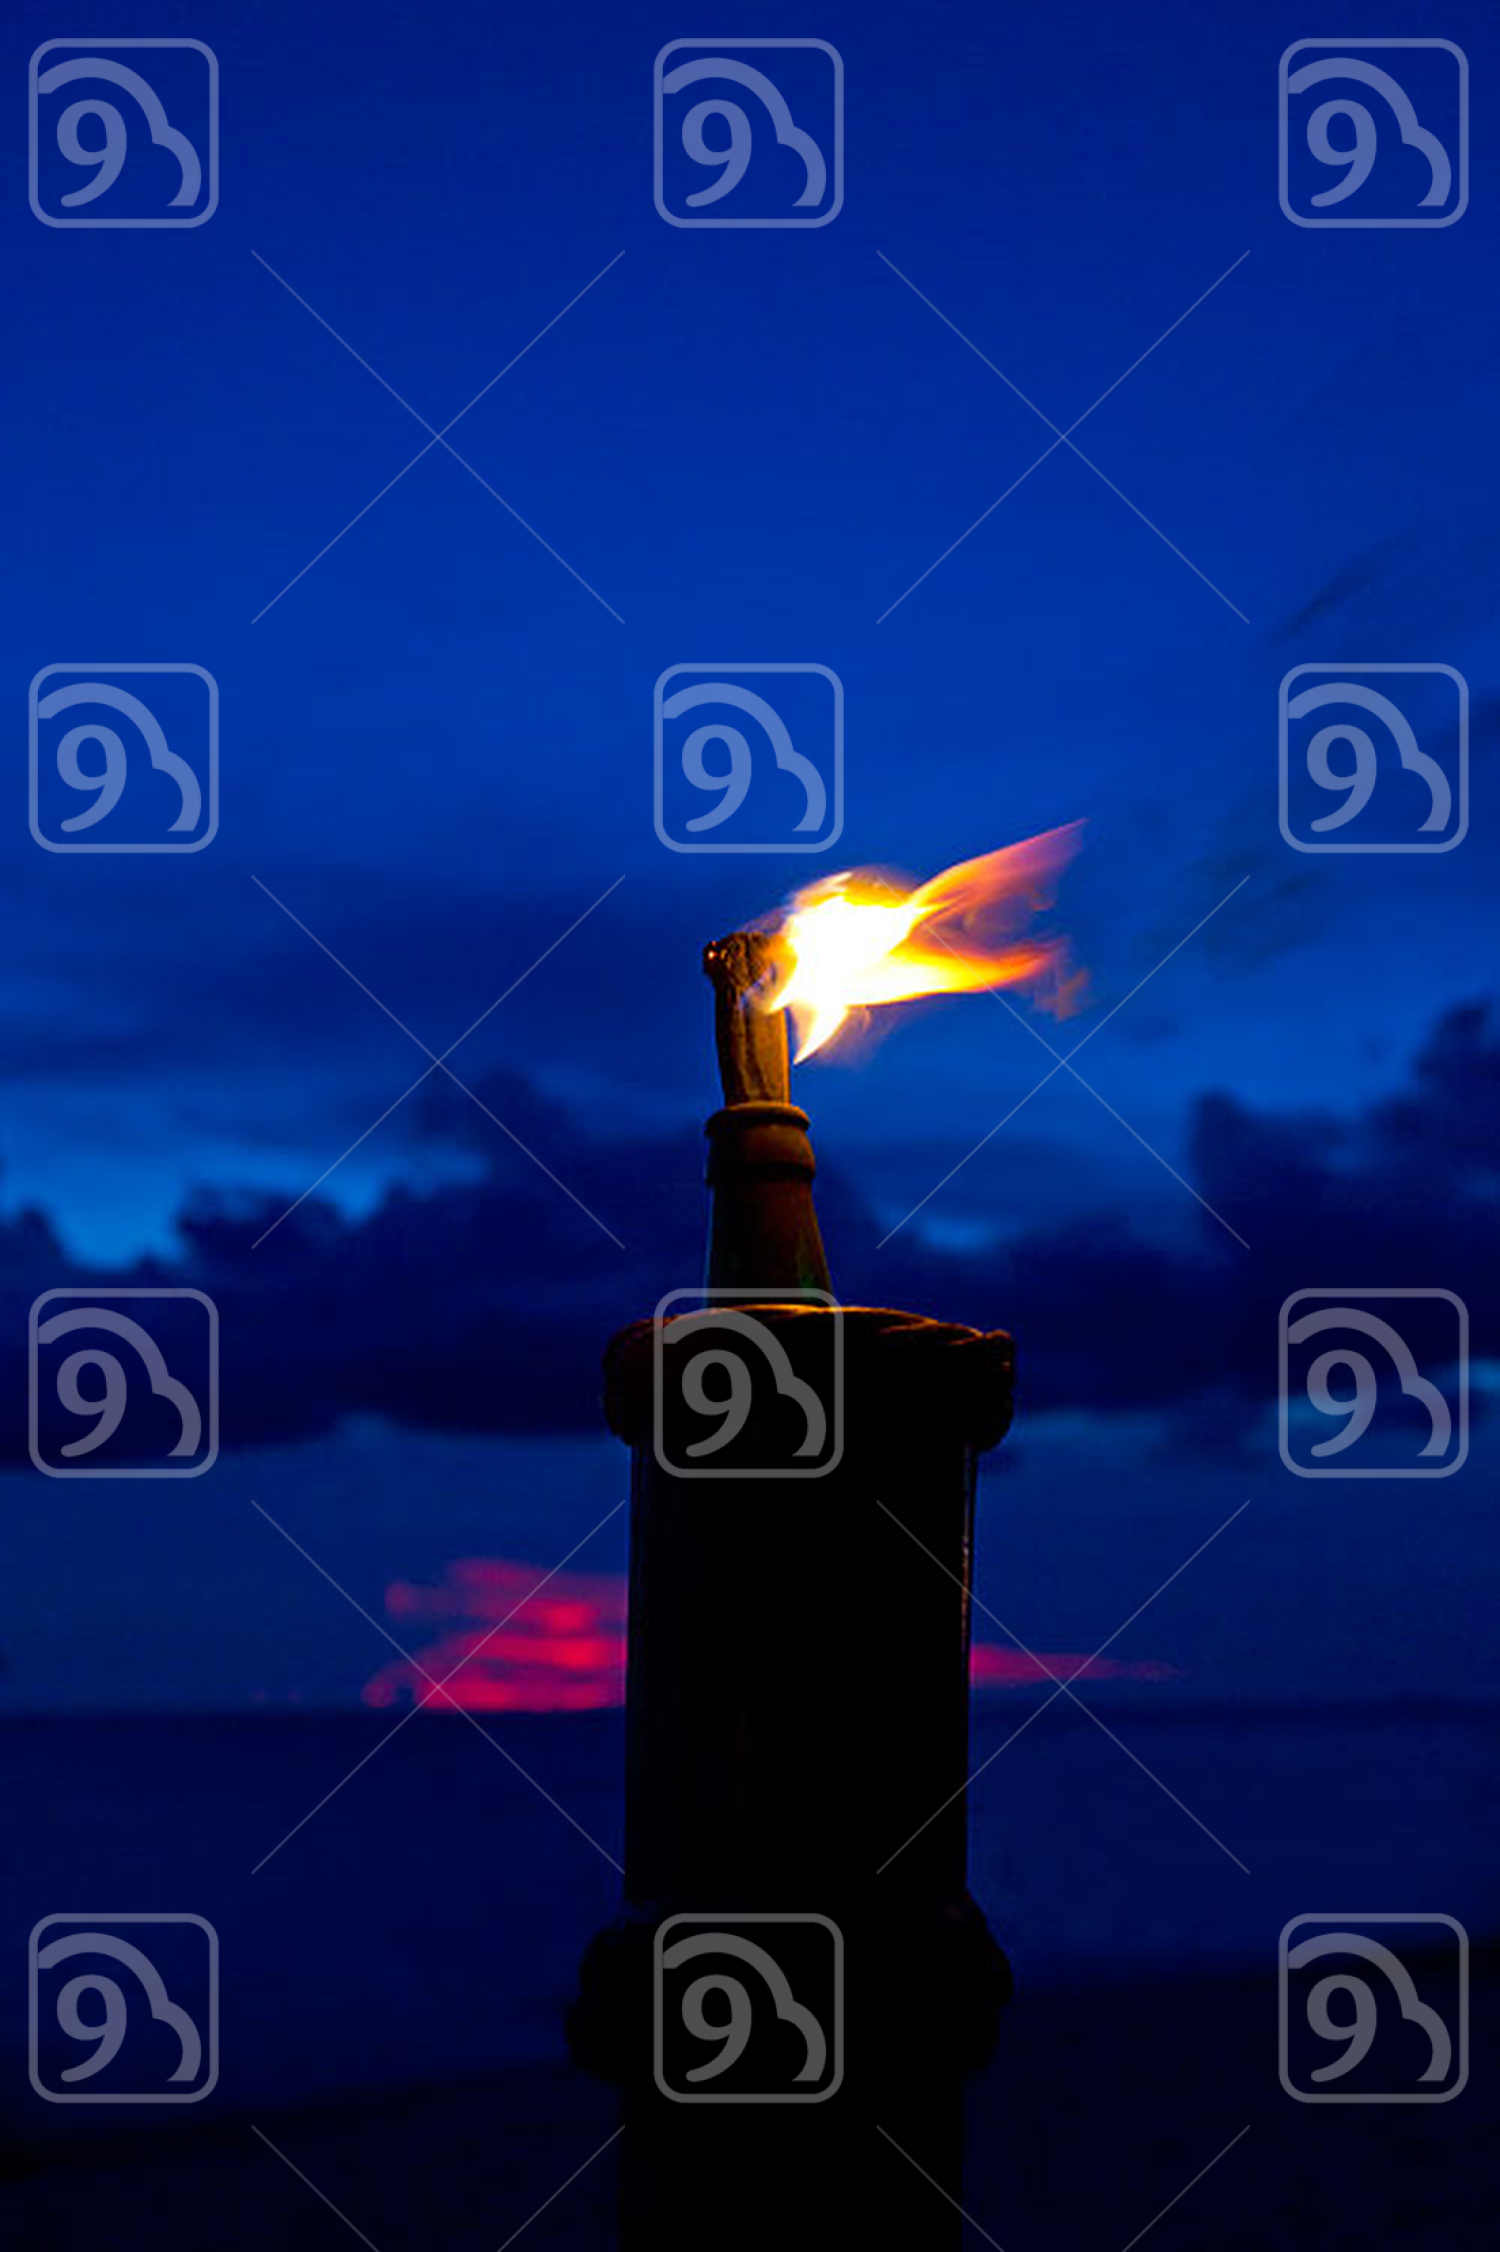 Firebrand in night